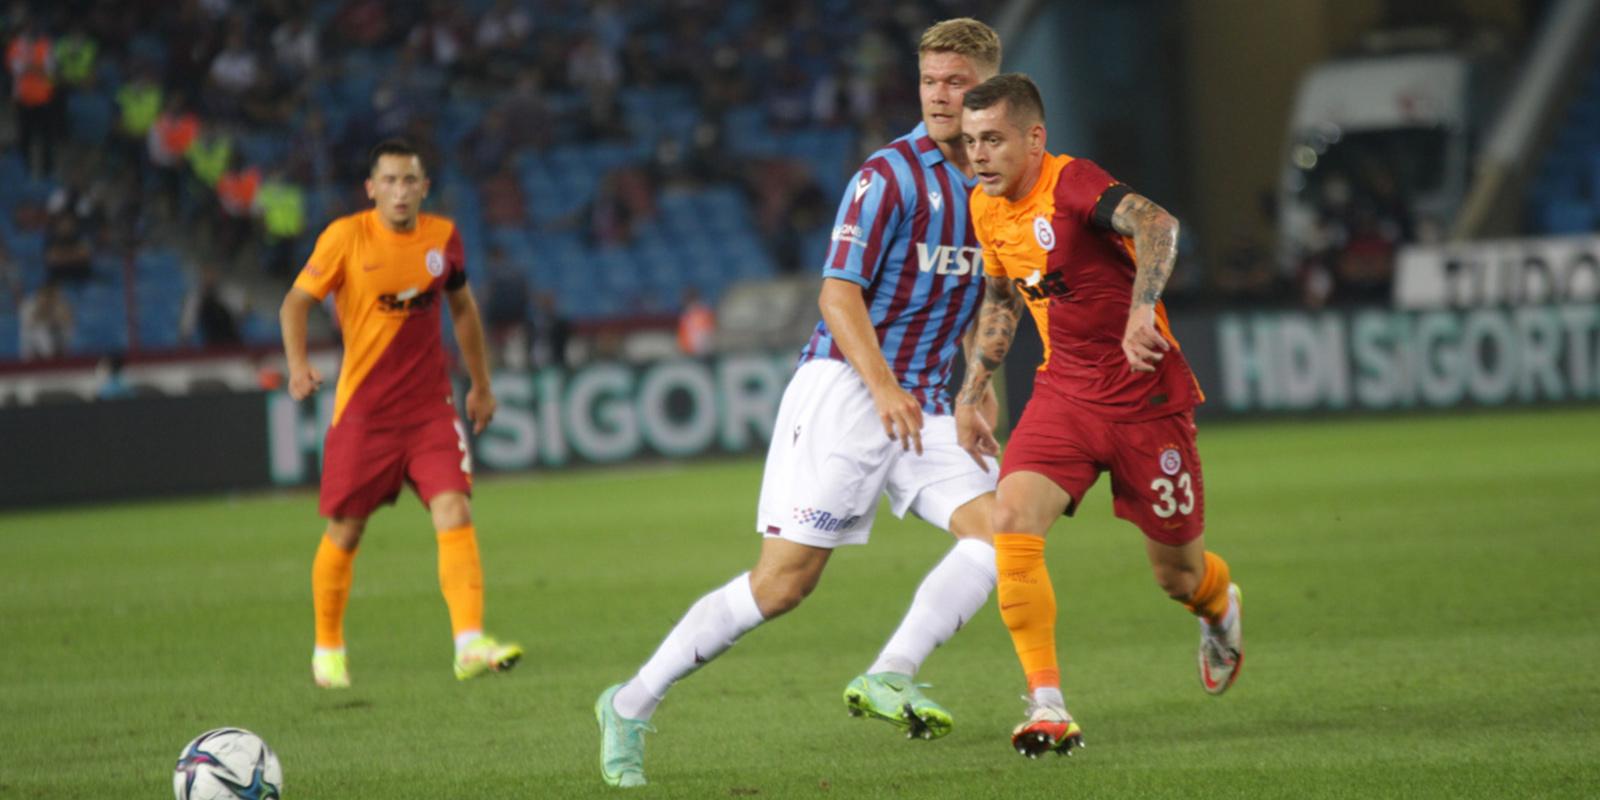 Trabzonspor 2 - 2 Galatasaray | MAÇ SONUCU